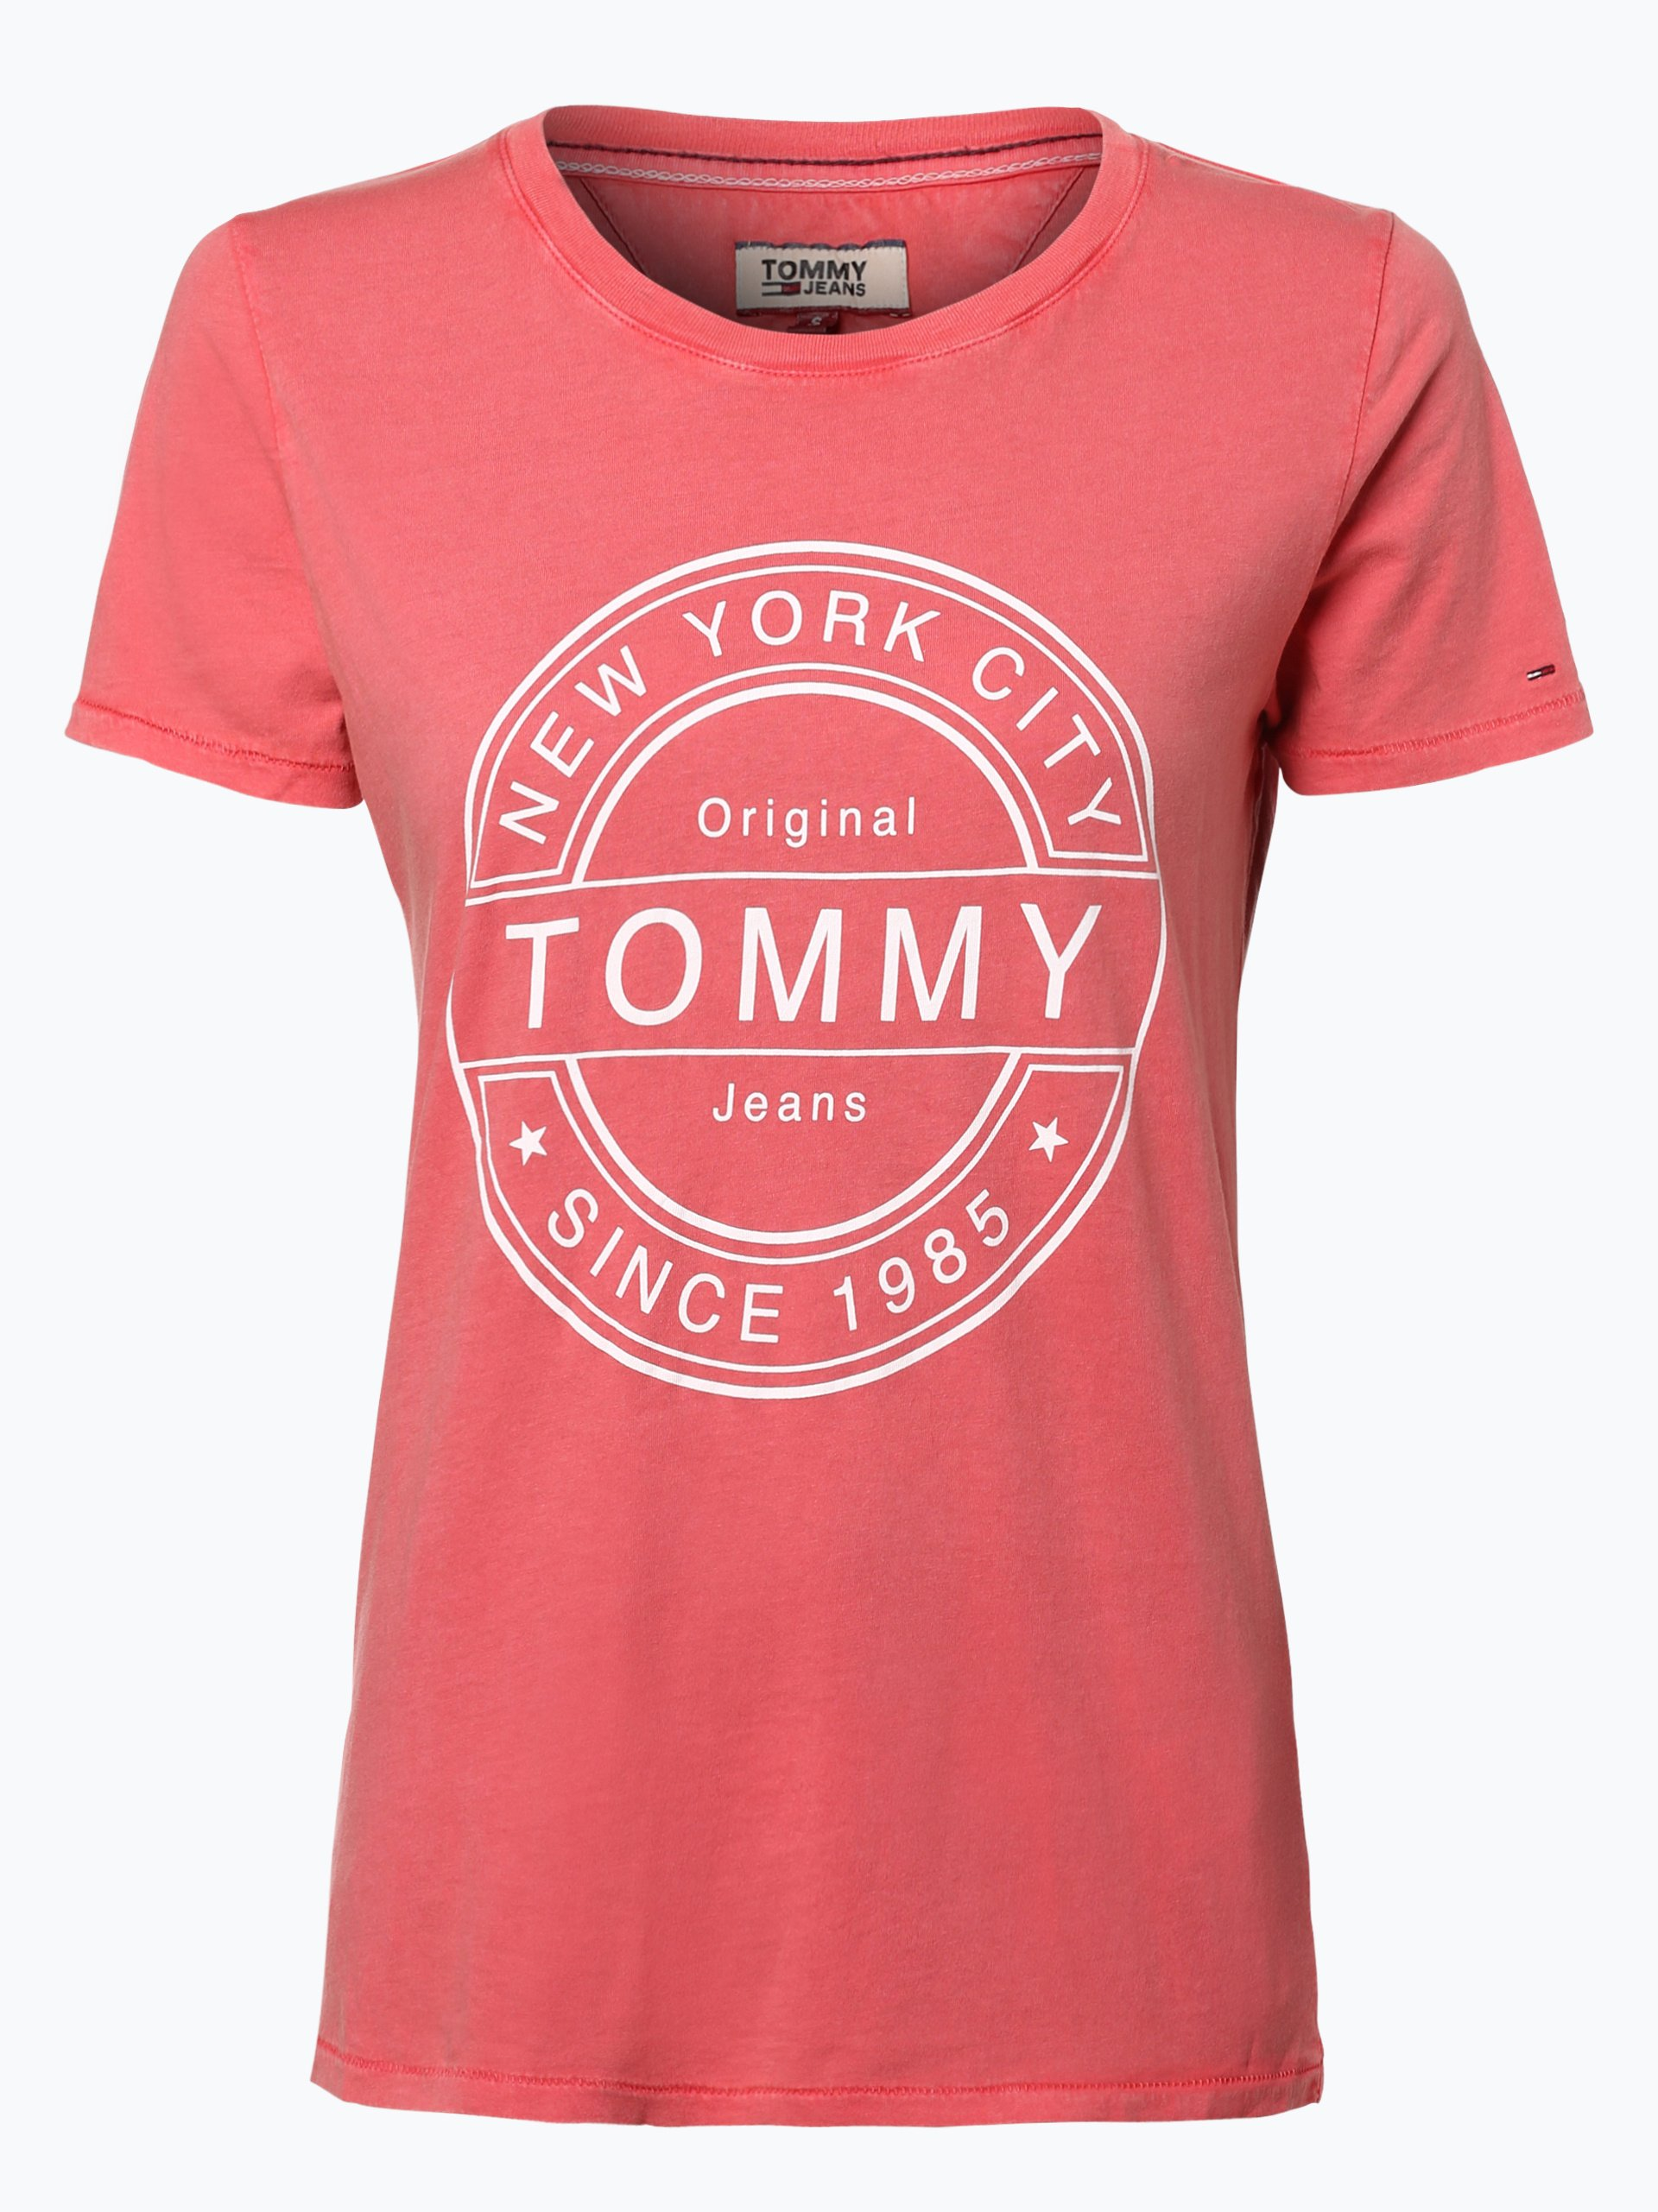 tommy jeans damen t shirt koralle gemustert online kaufen. Black Bedroom Furniture Sets. Home Design Ideas